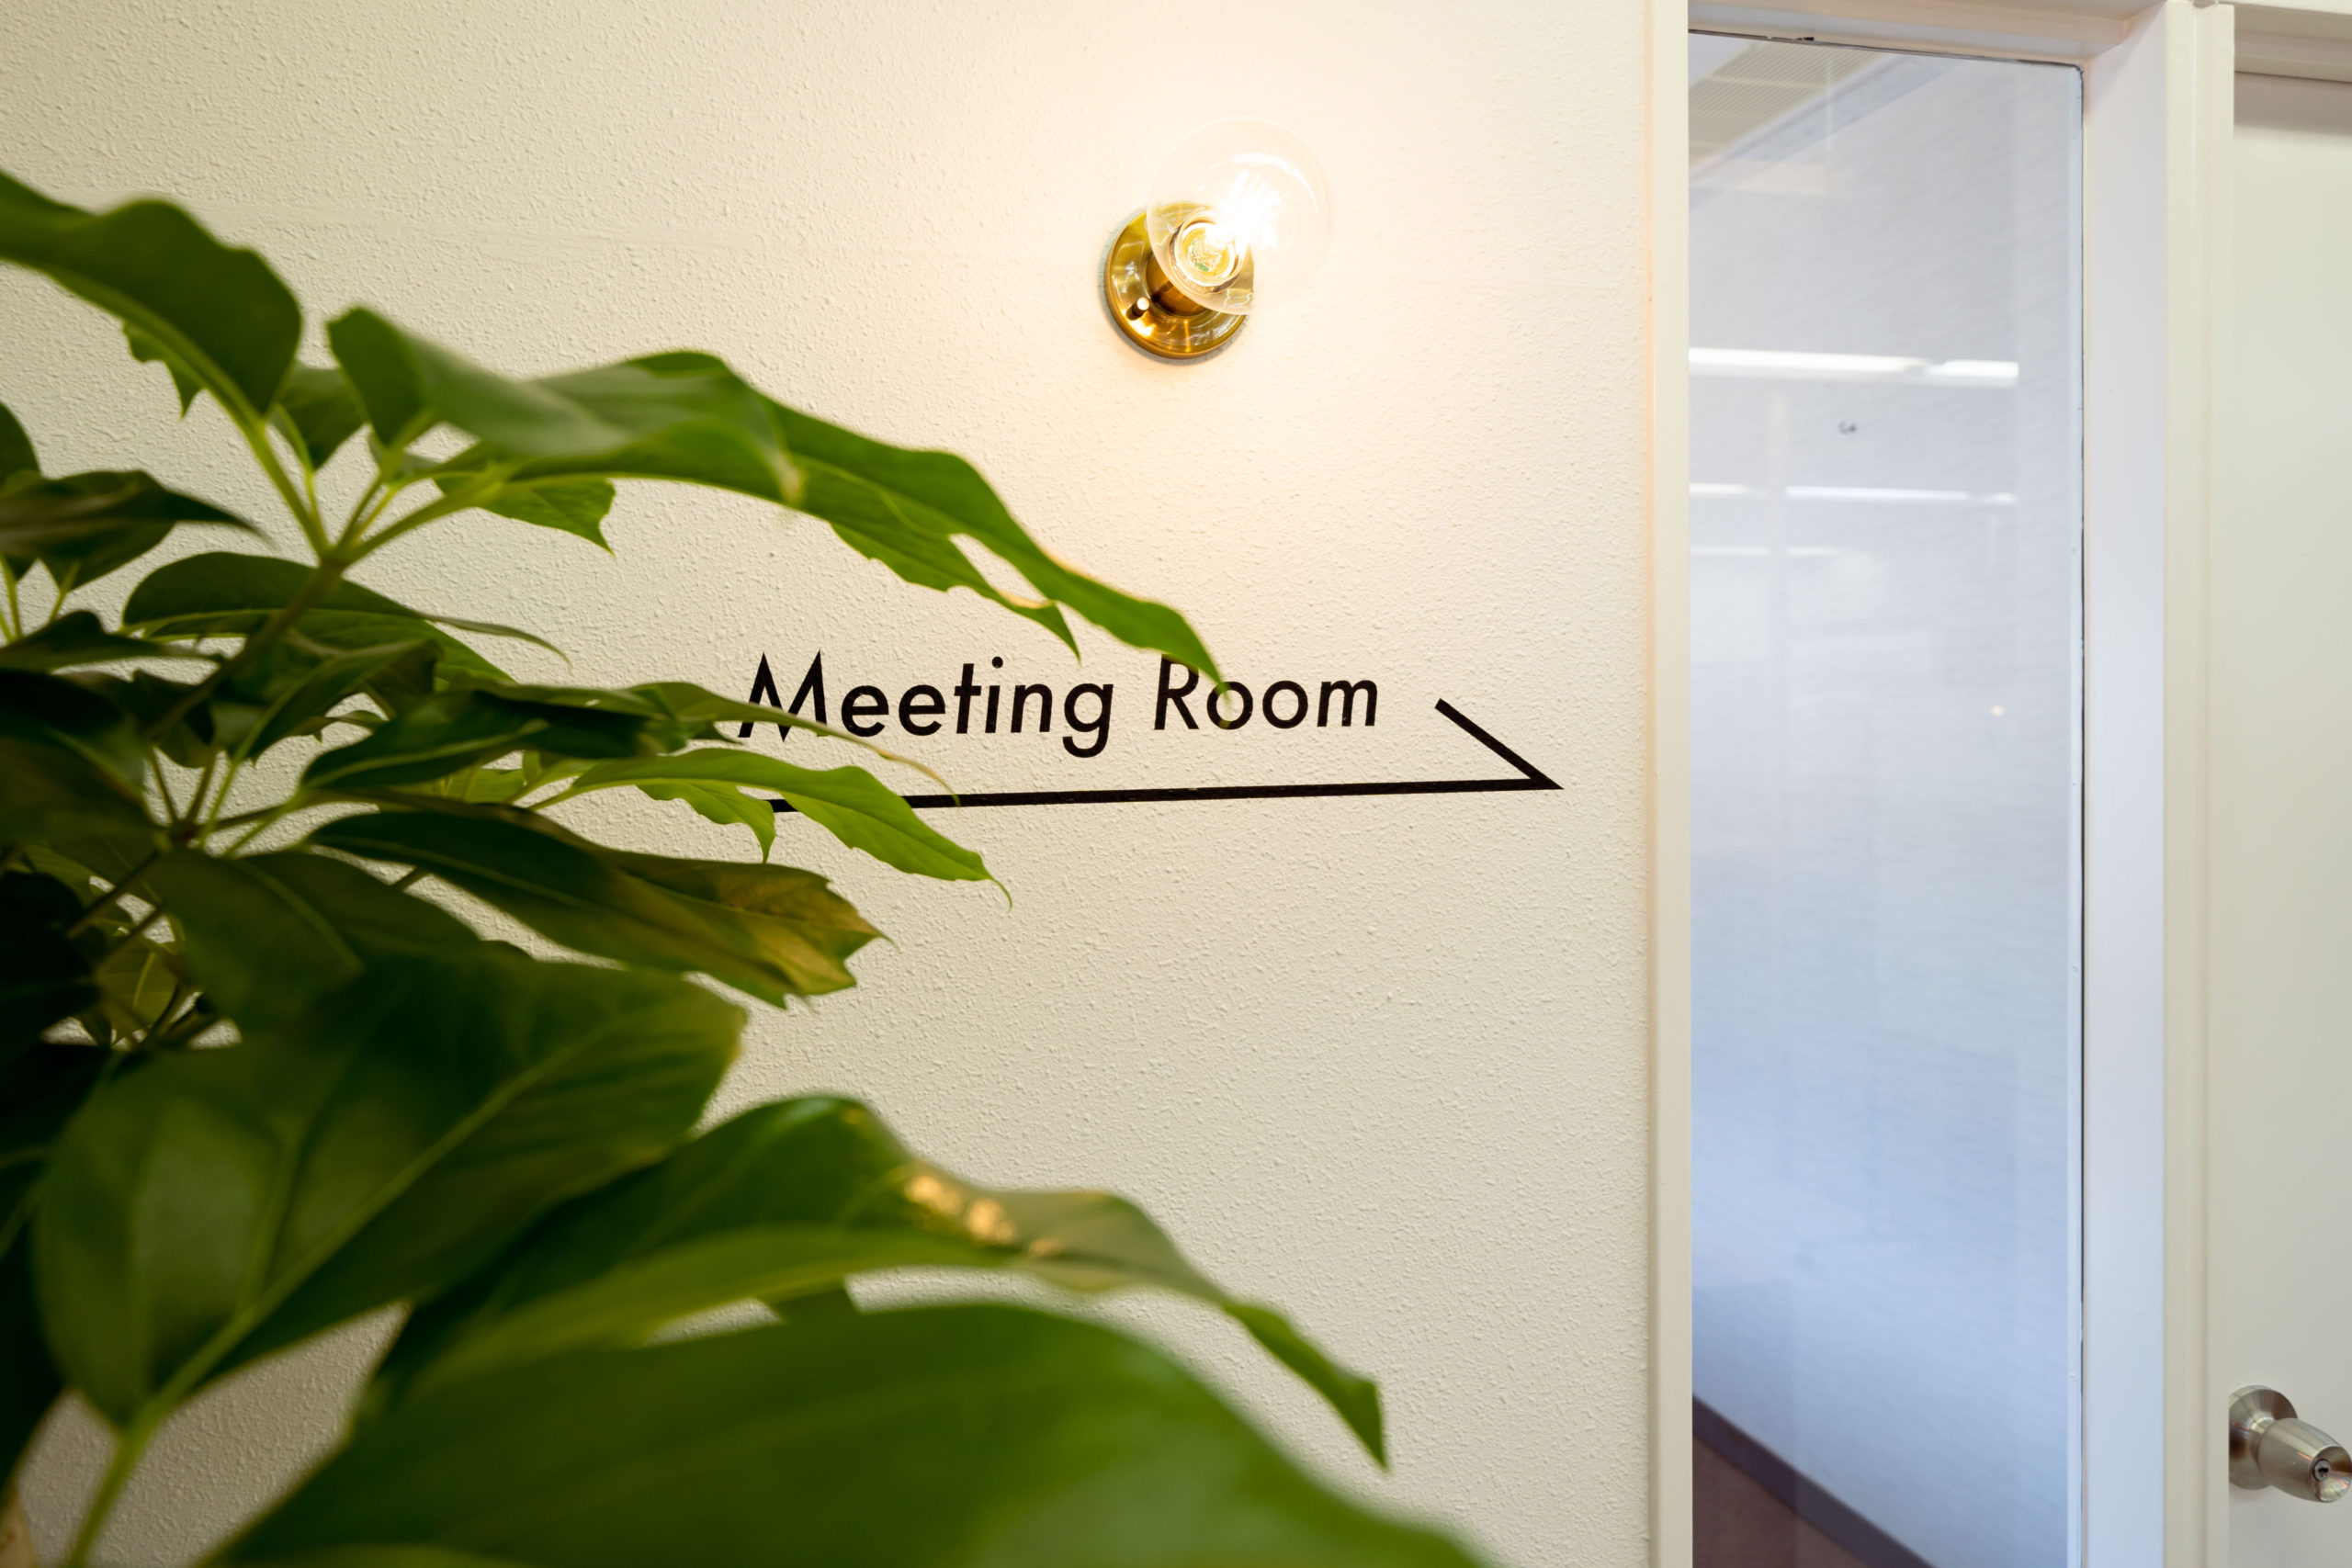 Meeting Roomはこちら